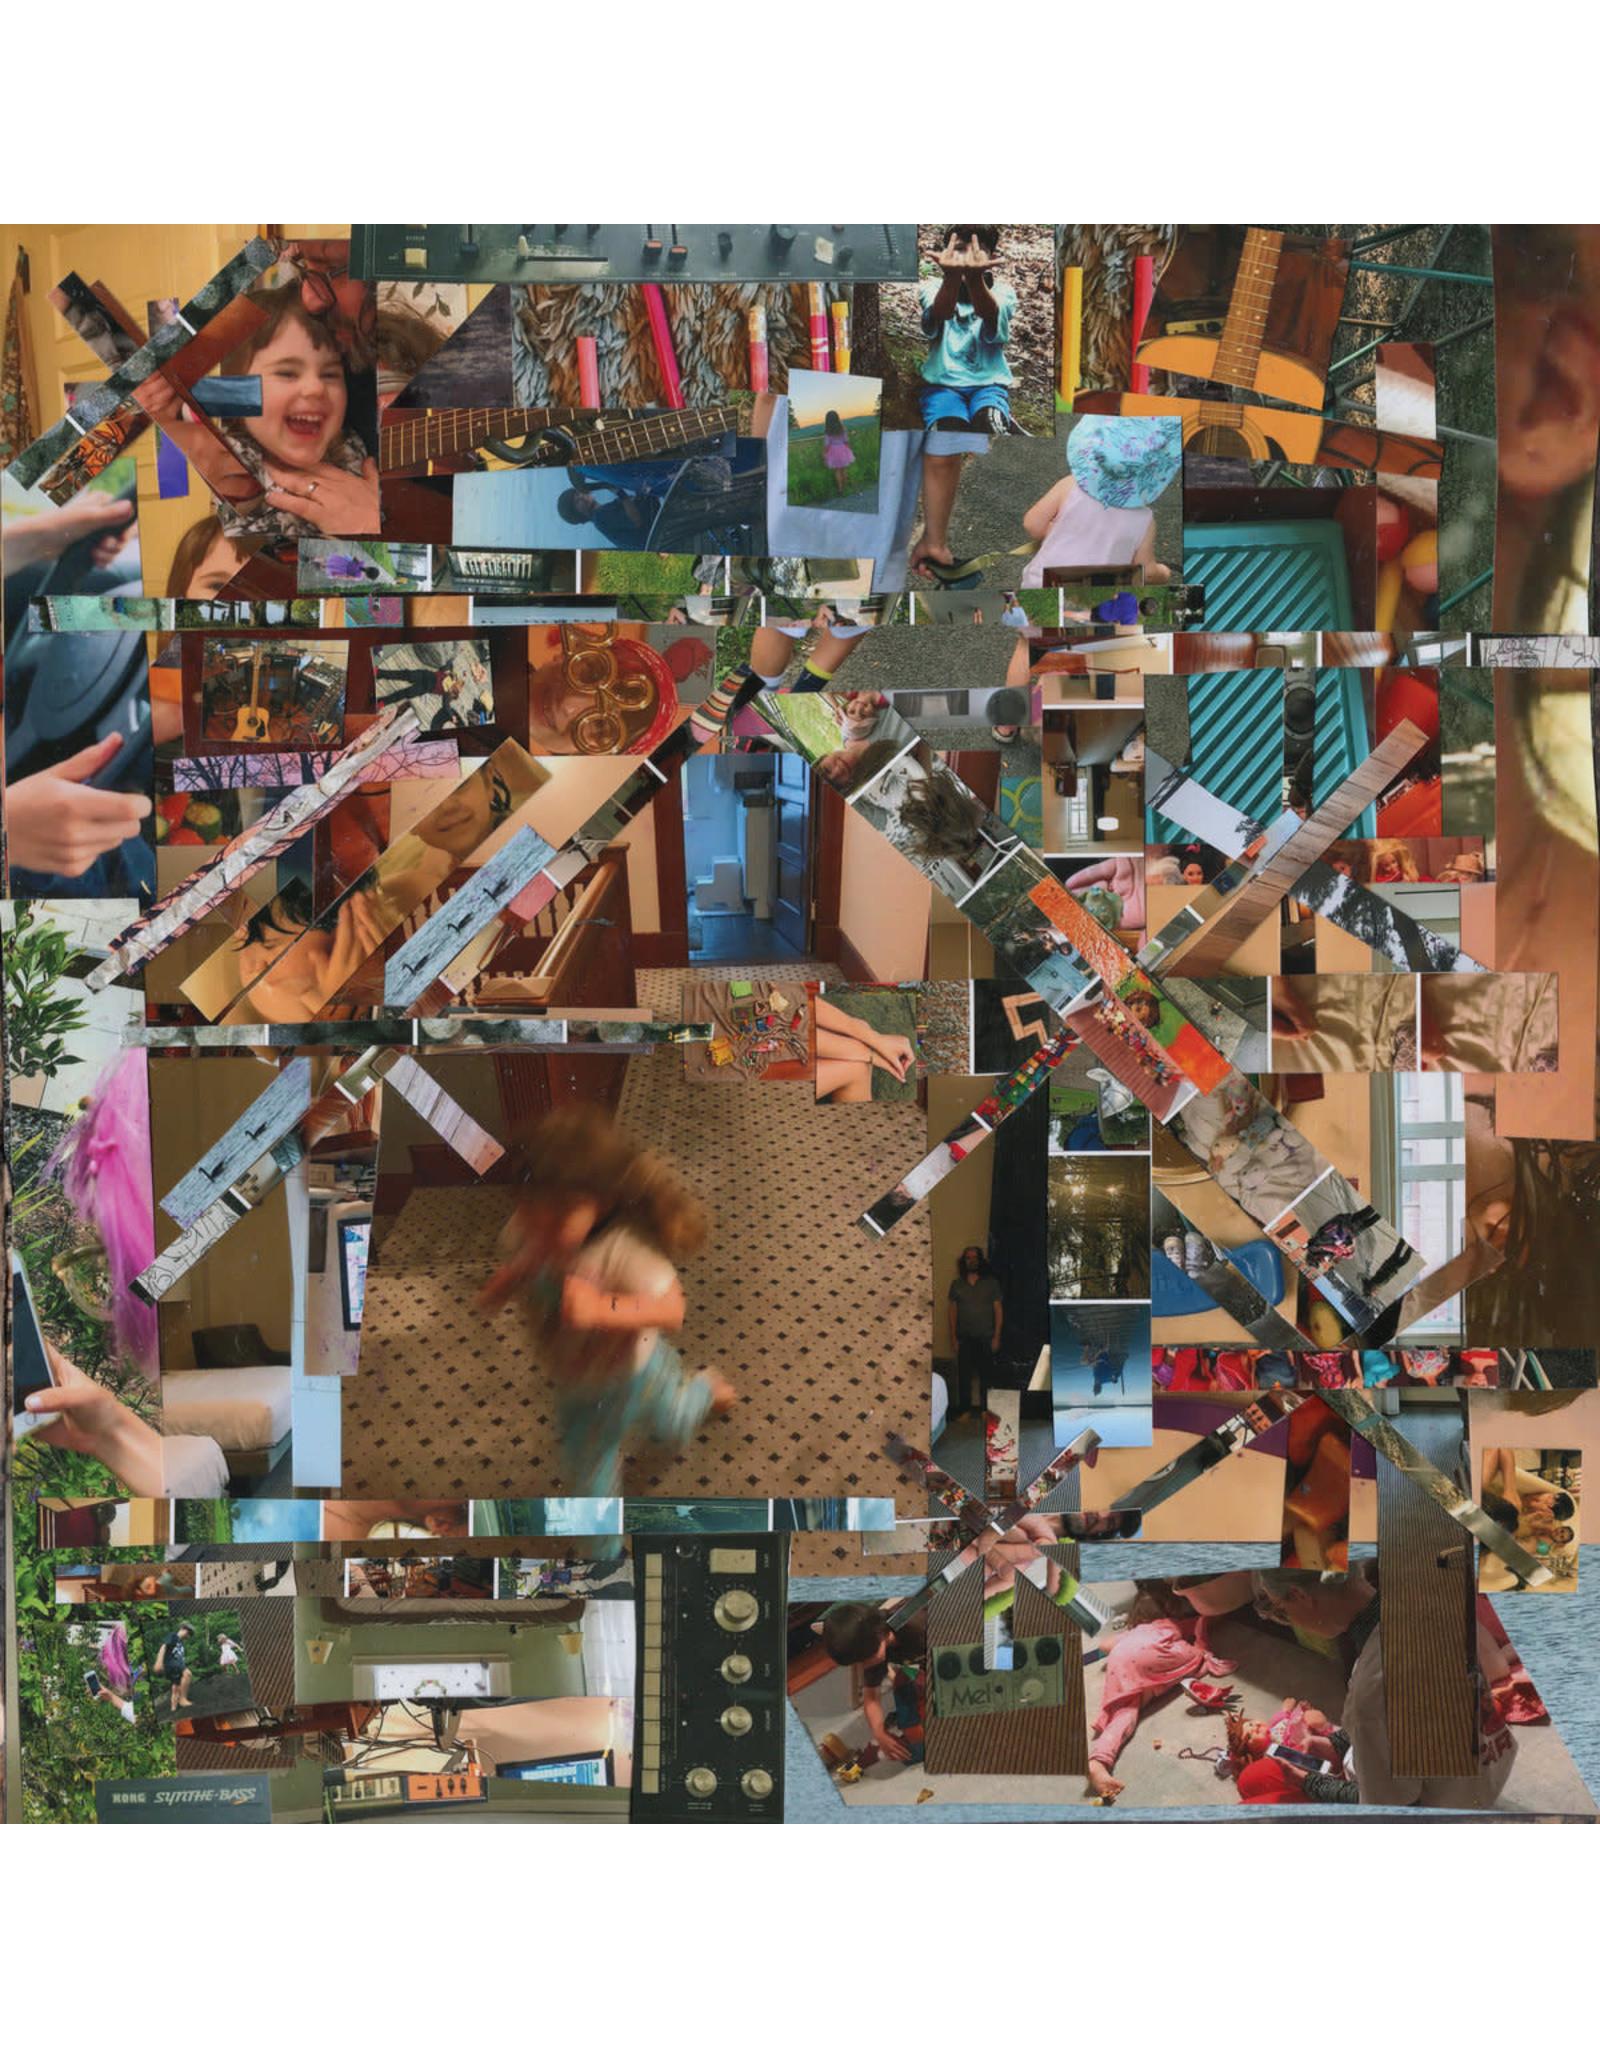 Barlow, Lou - Reason To Live LP (Baby Blue Vinyl)